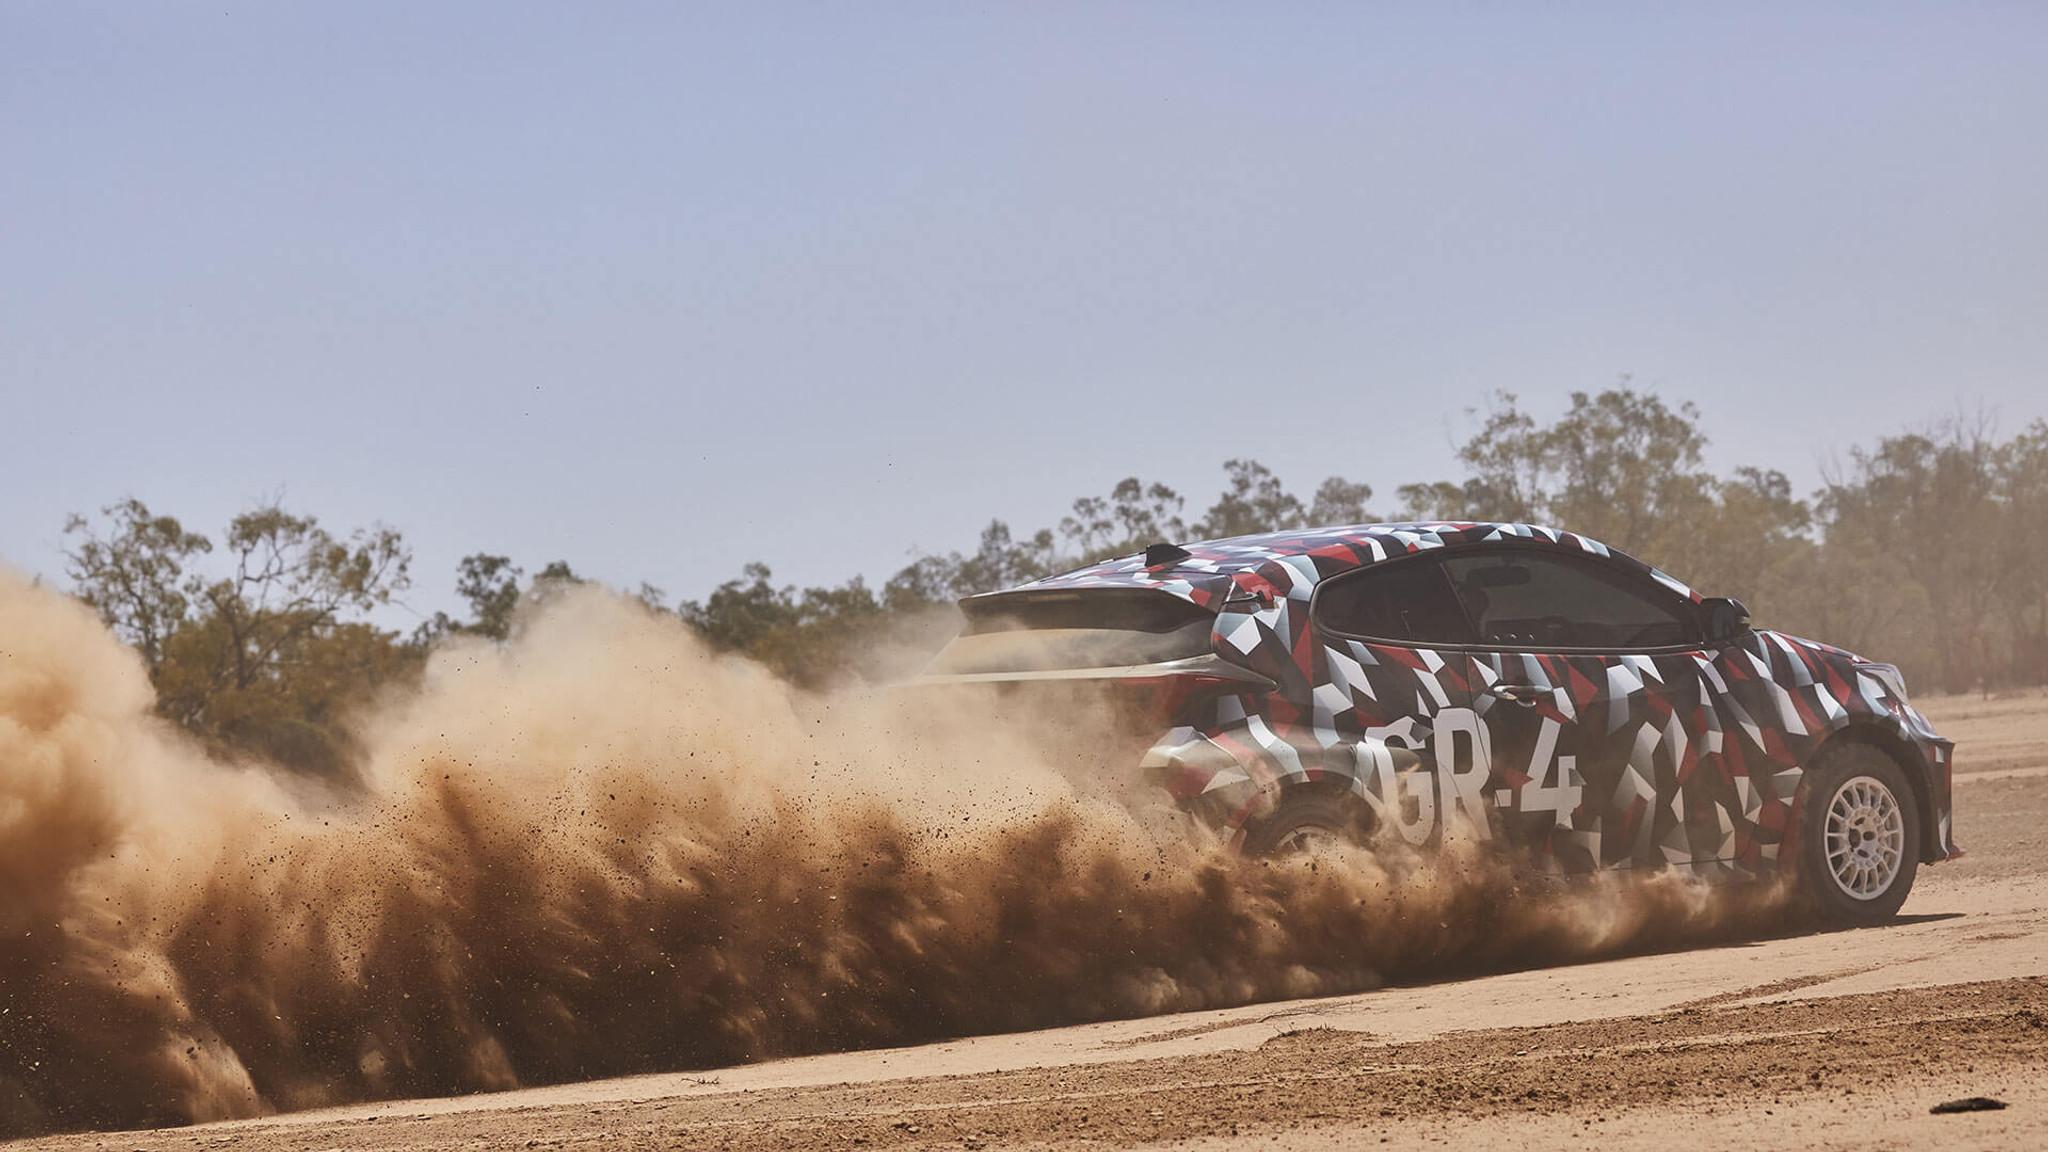 Toyota GR Yaris World Premiere in January | Phil Gilbert Toyota